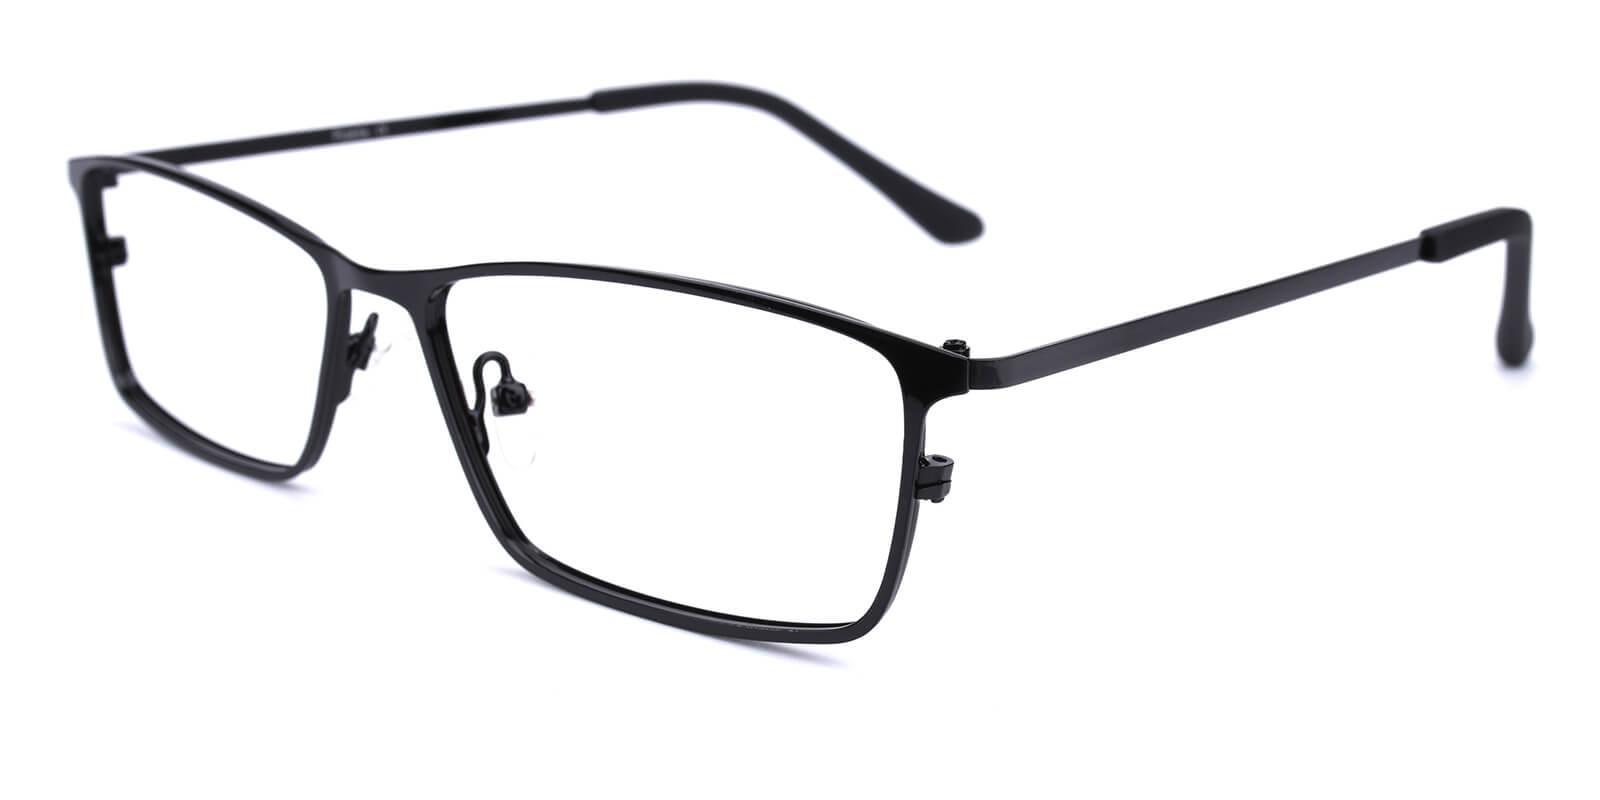 Wildfire-Black-Rectangle-Metal-Eyeglasses-detail